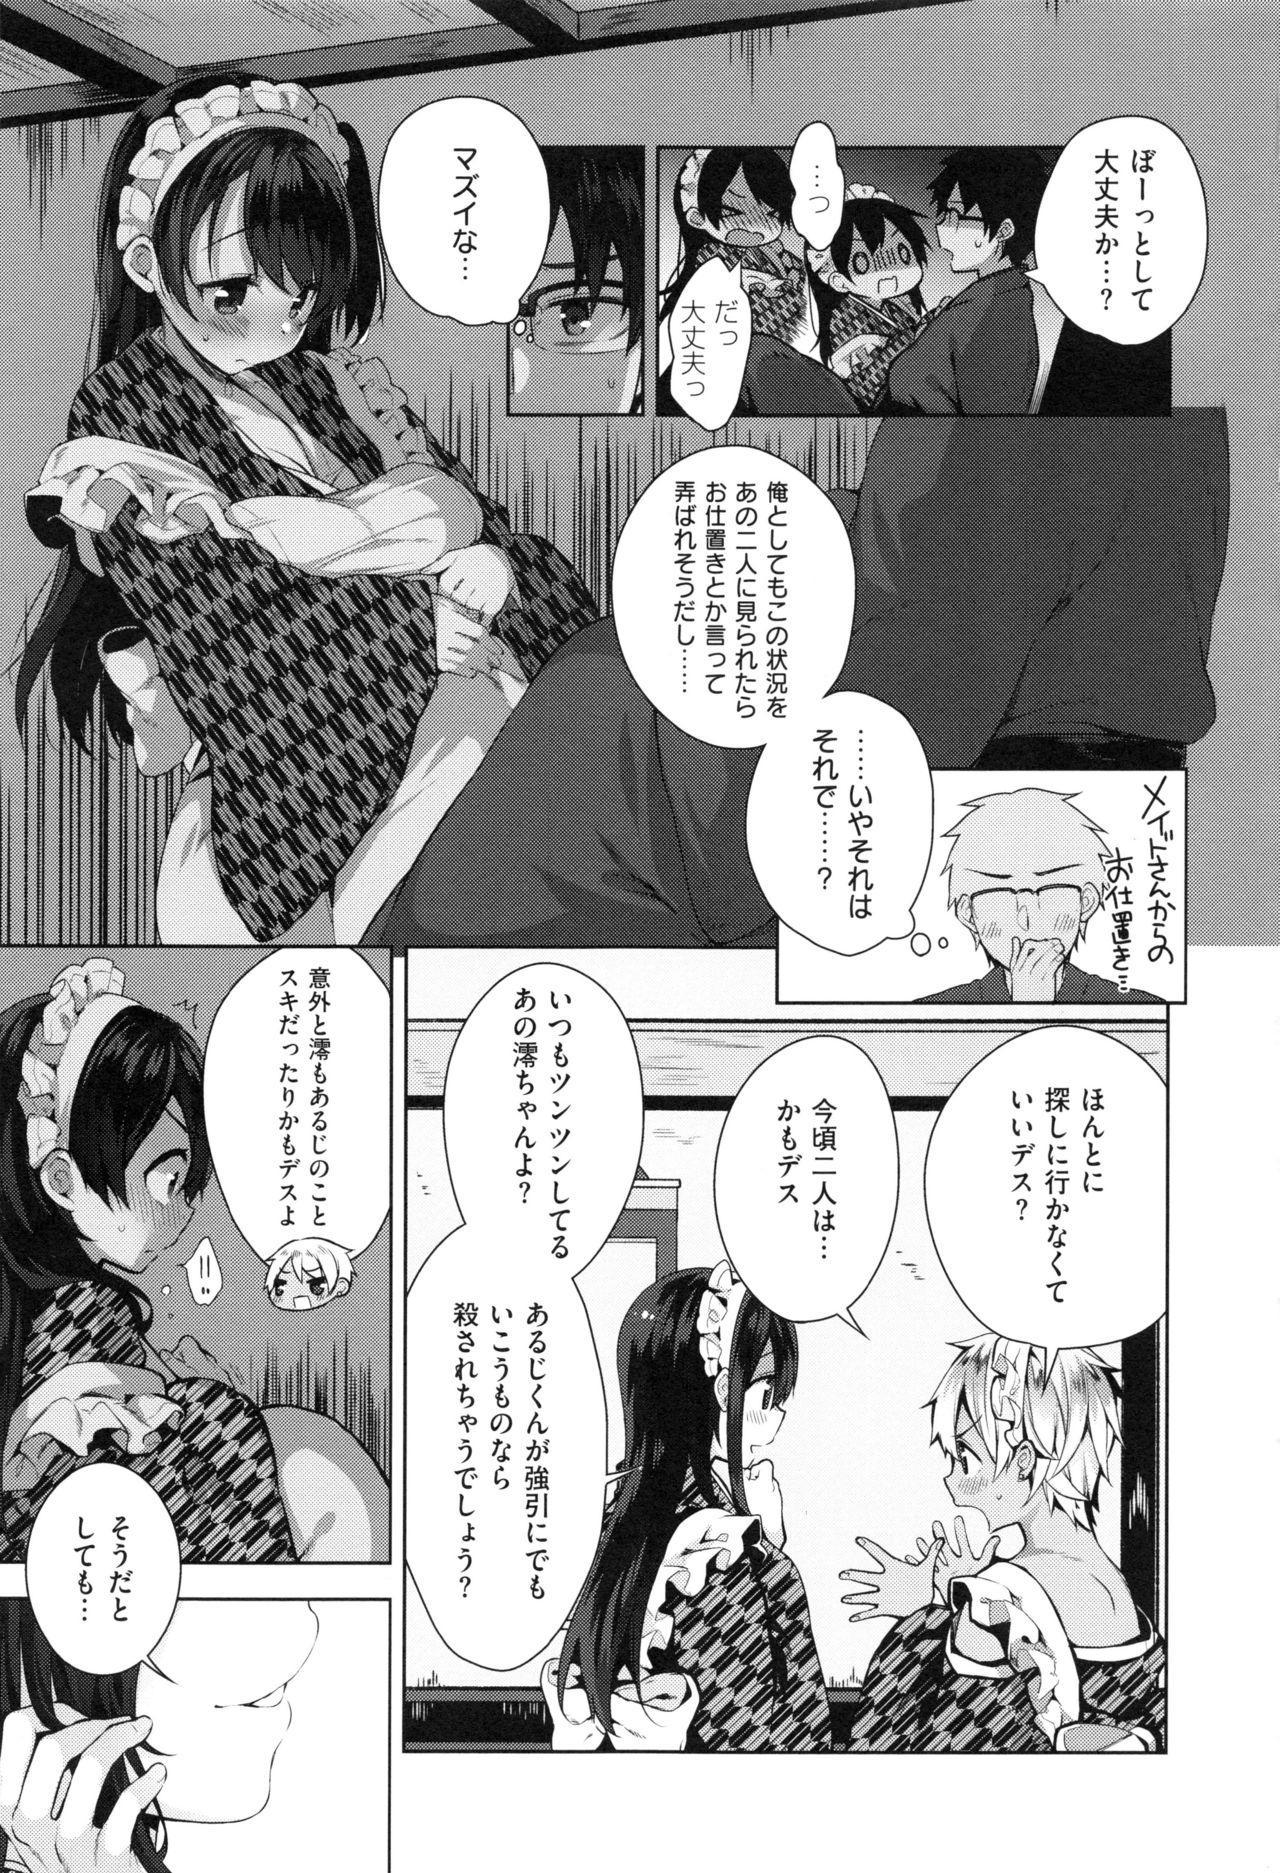 Himitsudere - Secret Love 84